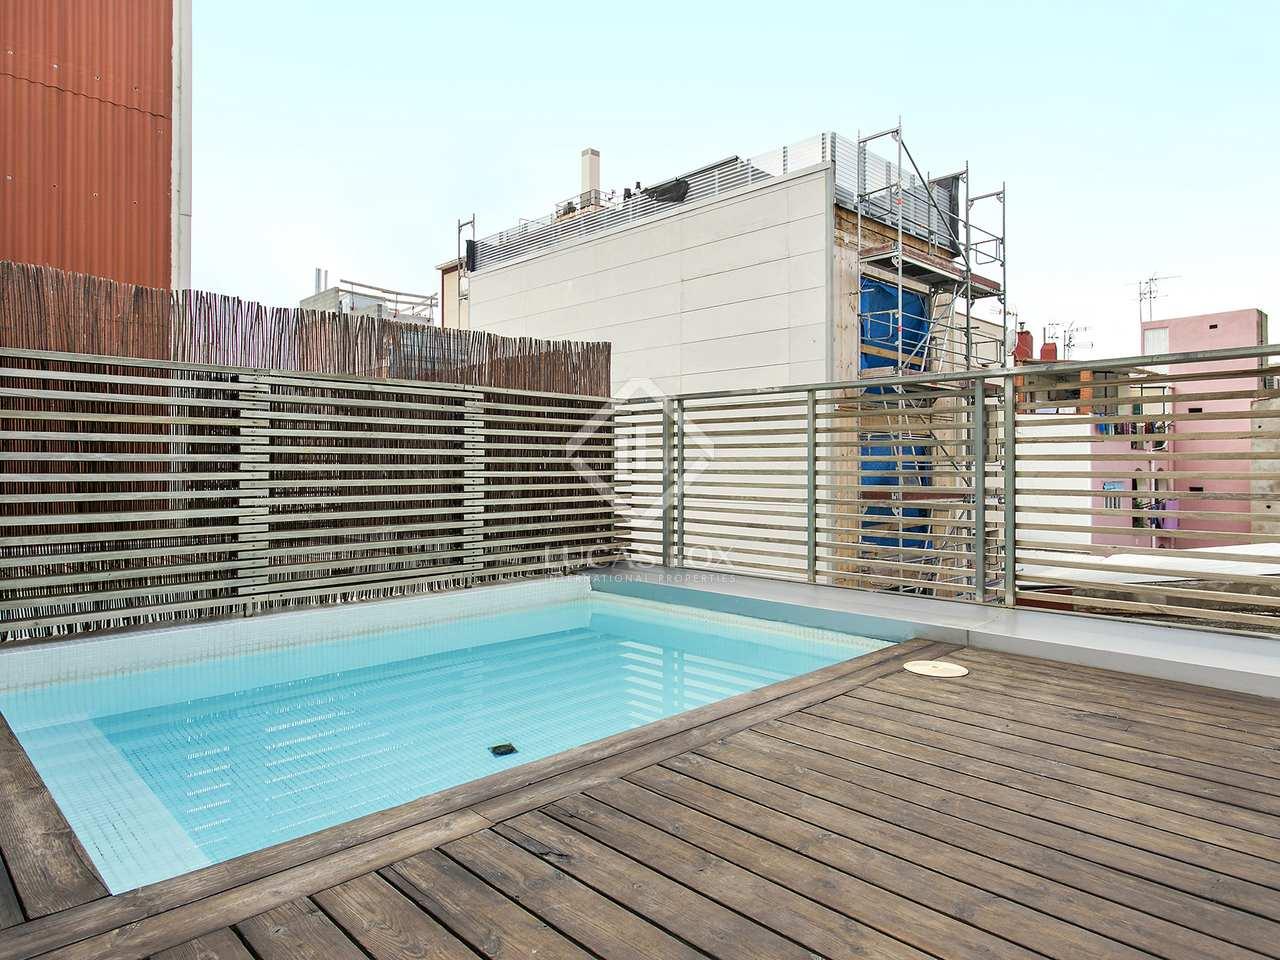 Casa moderna de 140m en alquiler en poblenou barcelona for Casa minimalista barcelona alquiler